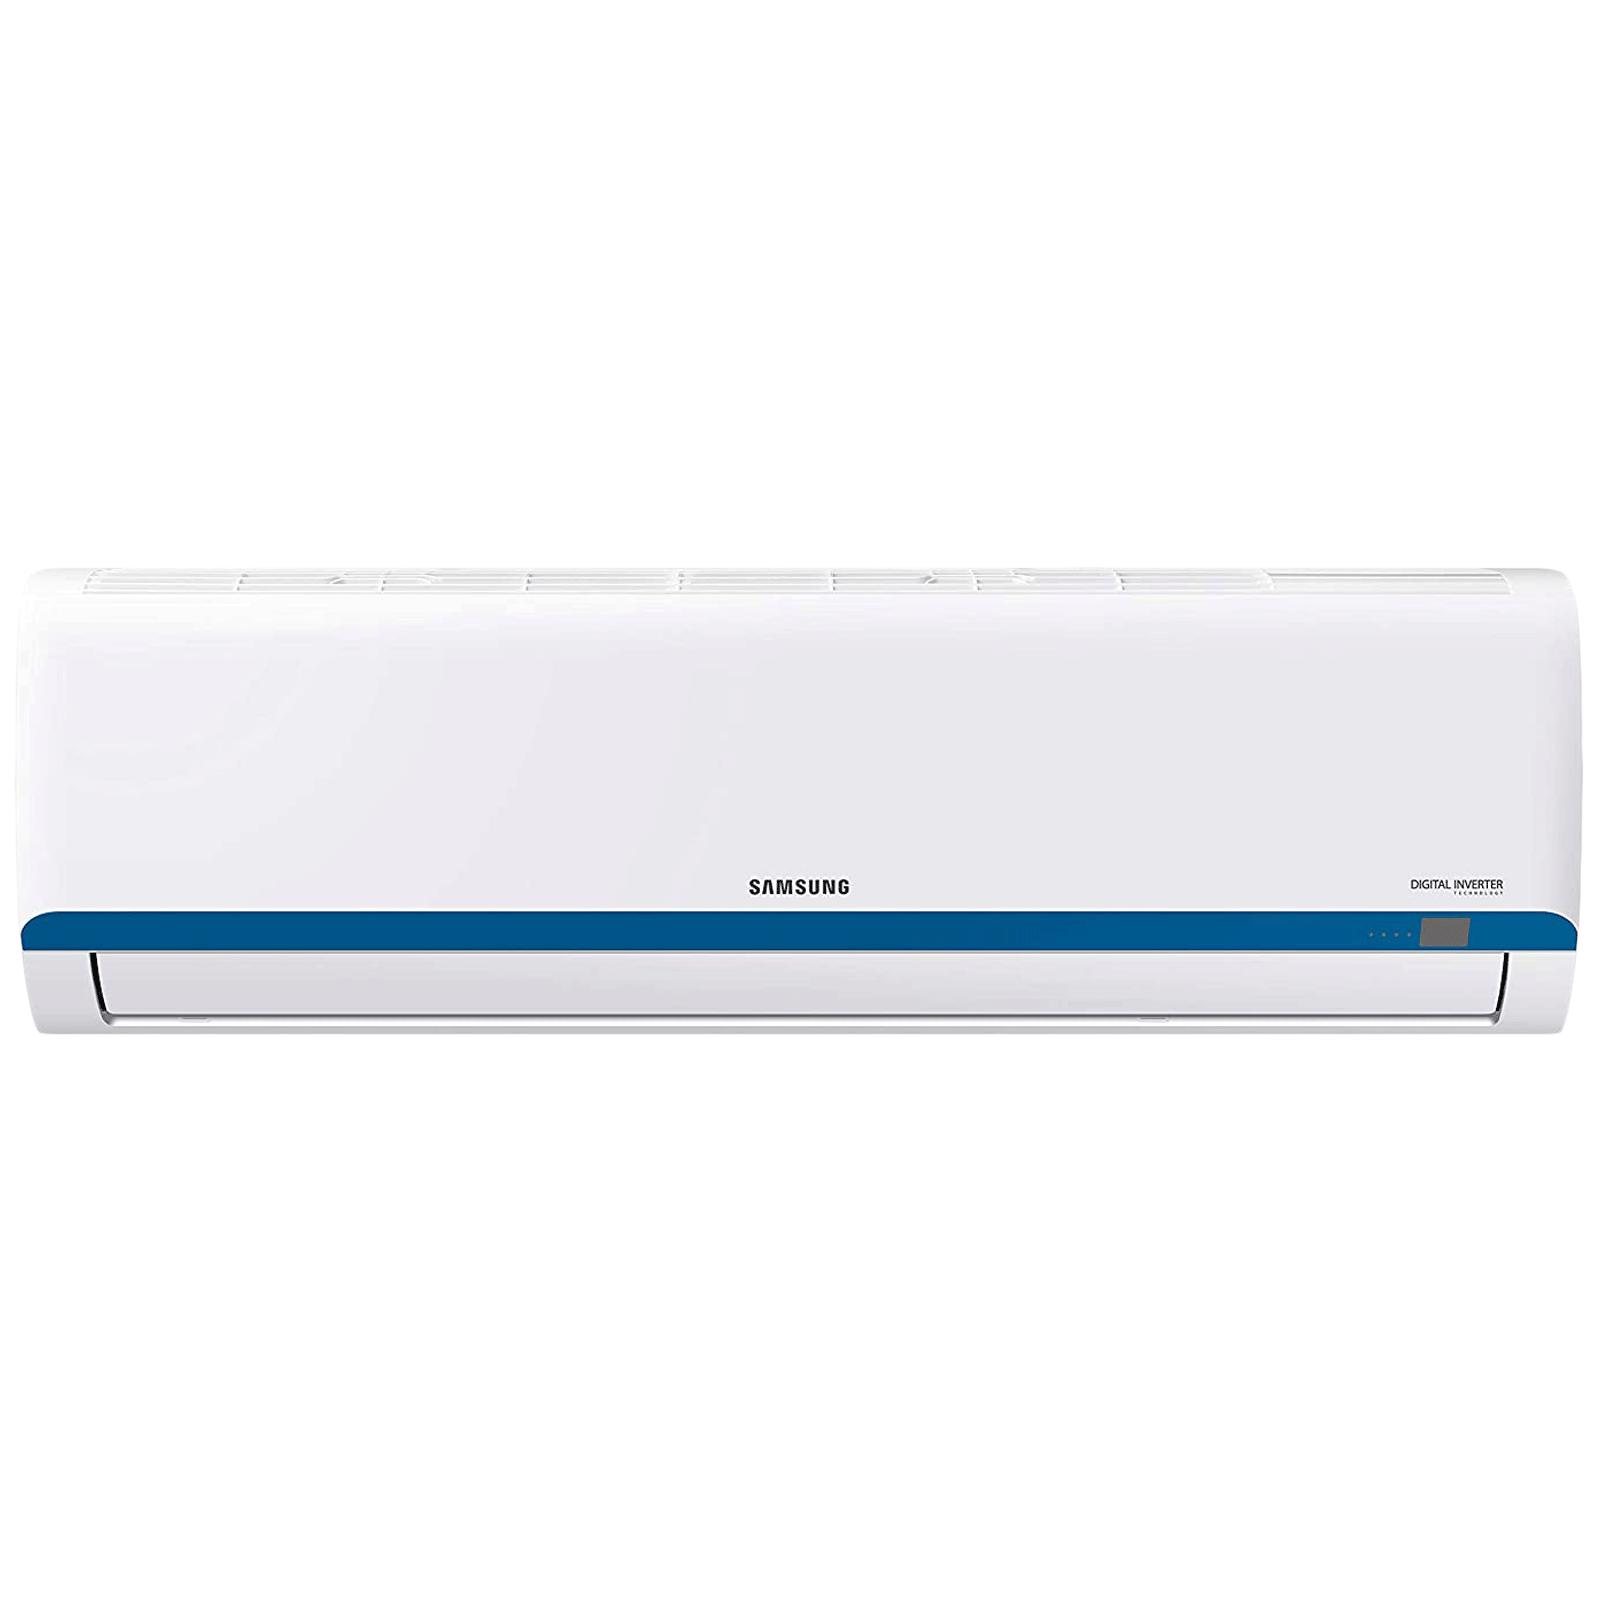 Samsung Super Series 1.5 Ton 3 Star Inverter Split AC (Copper Condenser, AR18TY3QBBU, White)_1